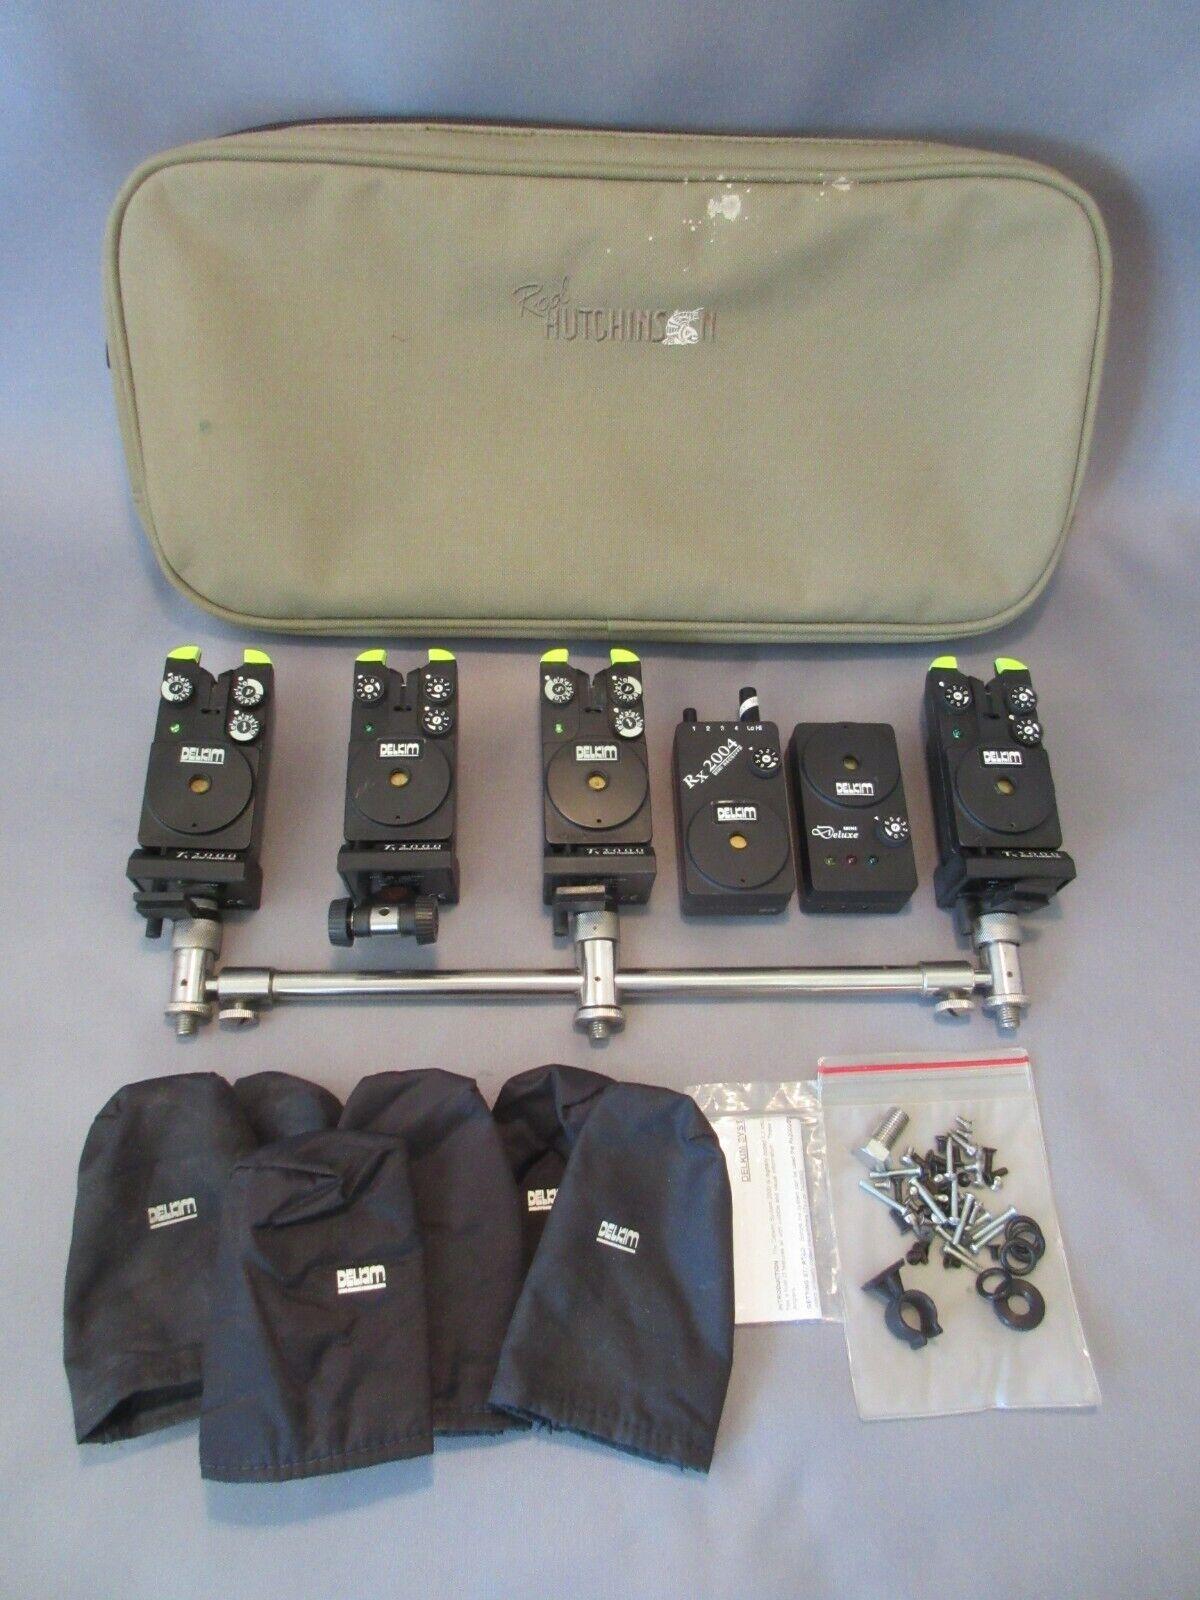 Carp alarms Delkim originals + Rod Hut nson case